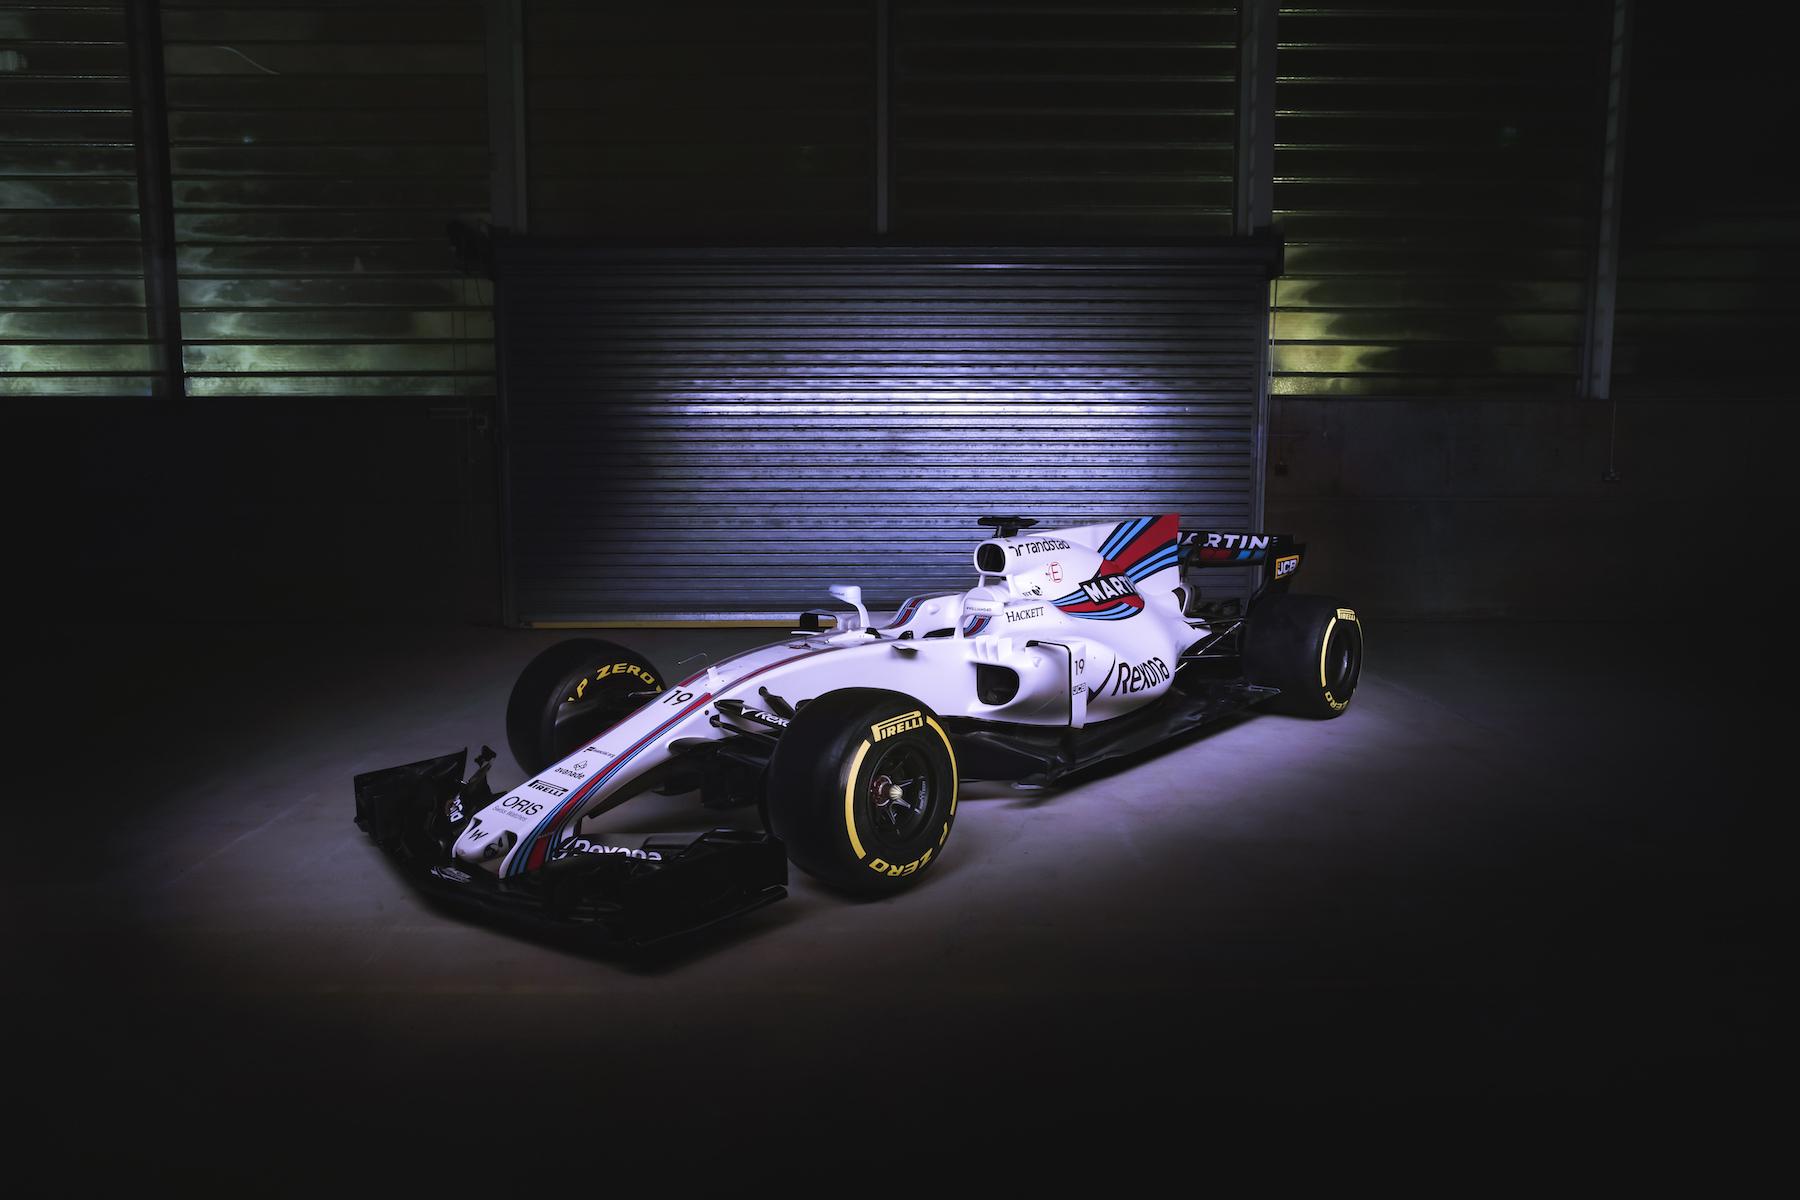 Salracing | Williams Mercedes FW40 1